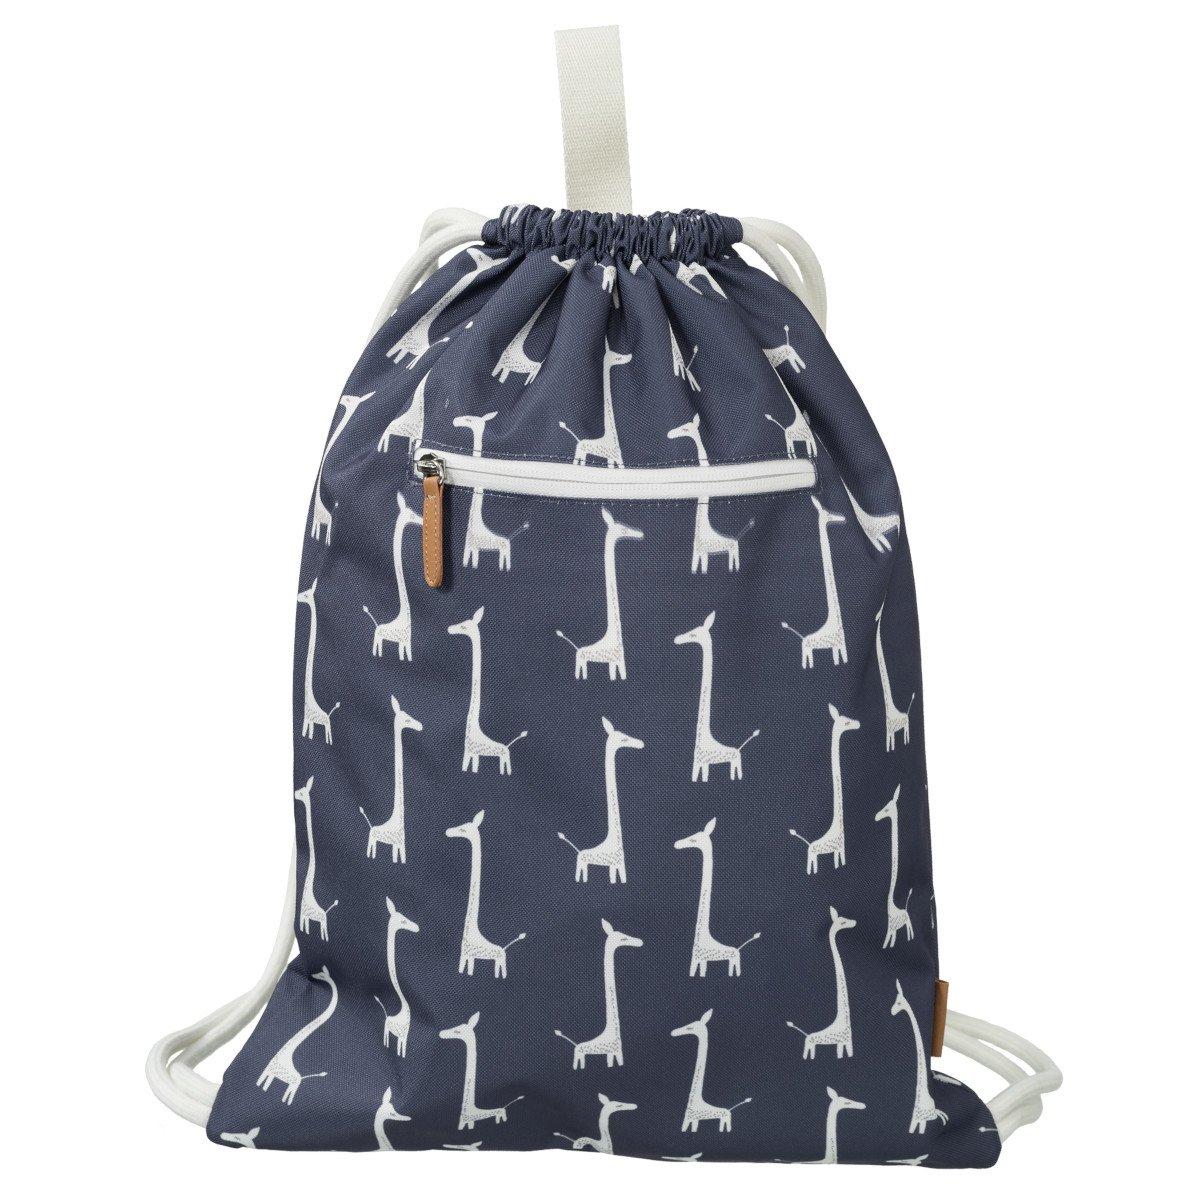 Waterproof Giraffe Fresk Bag for Children and Sports